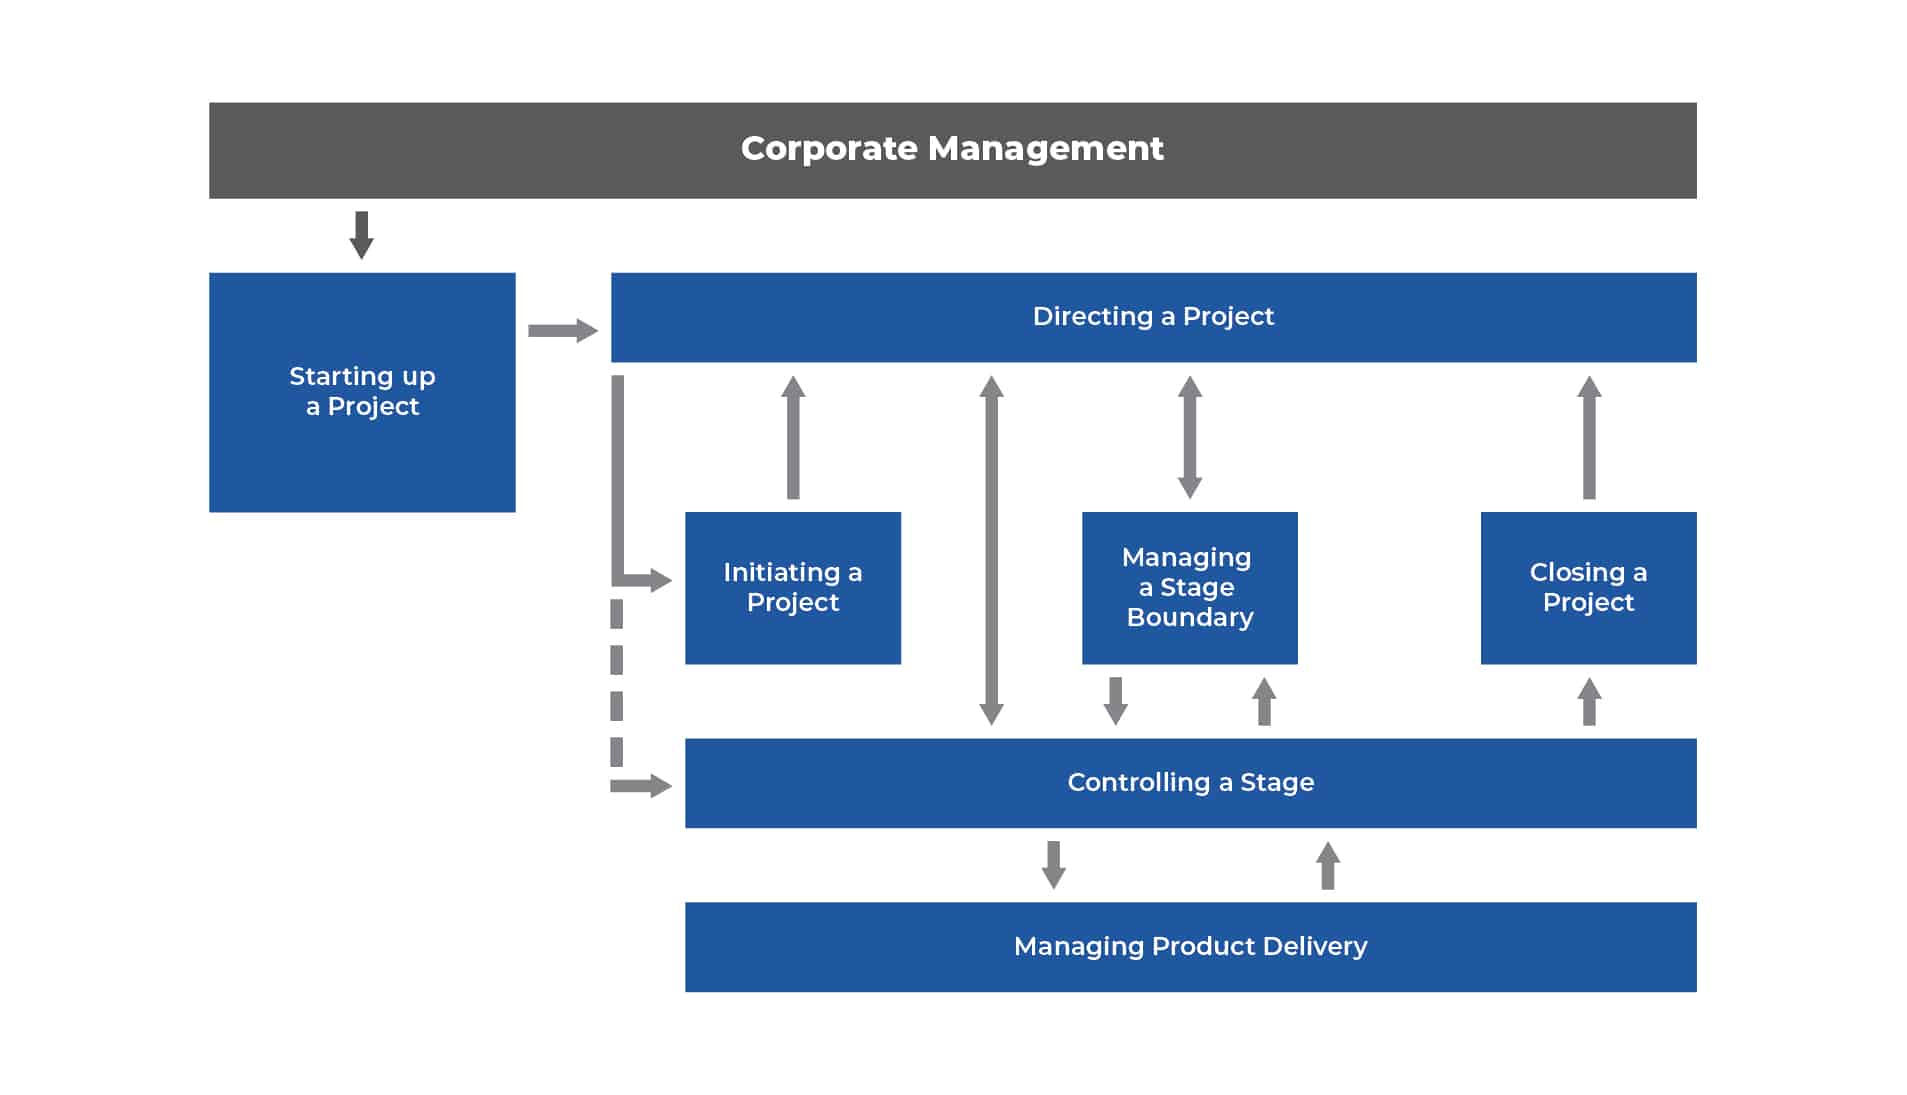 CorporateManagement